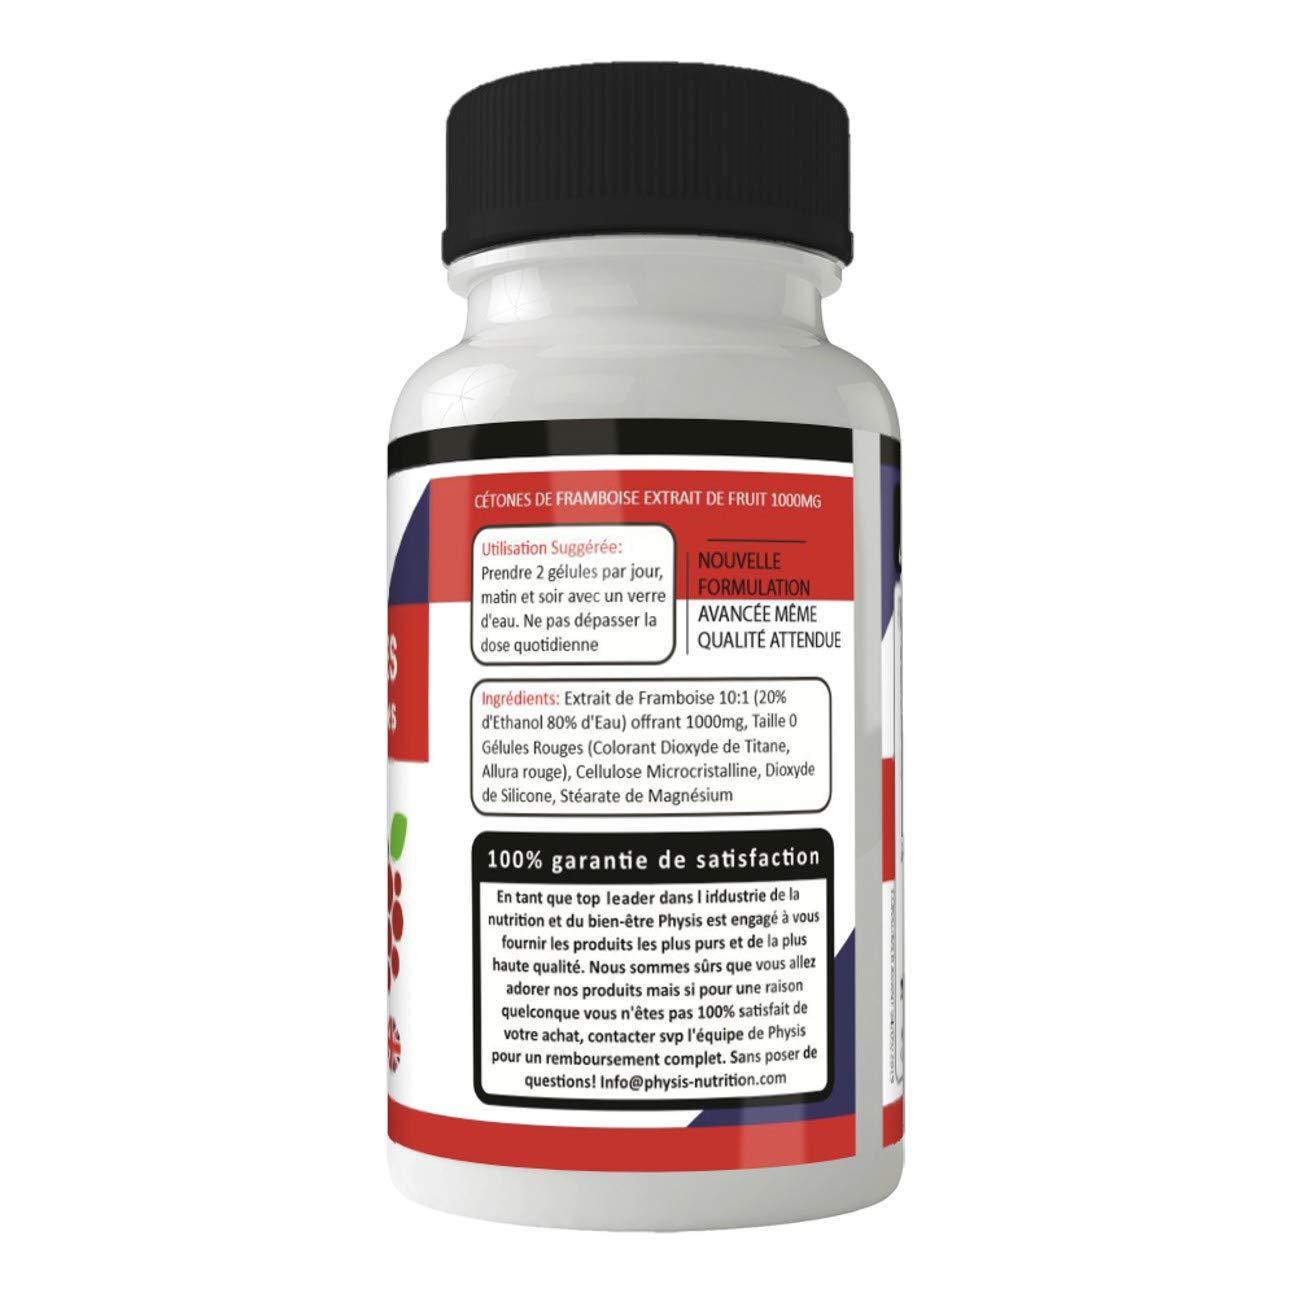 Medicament Pour Maigrir Framboise 94